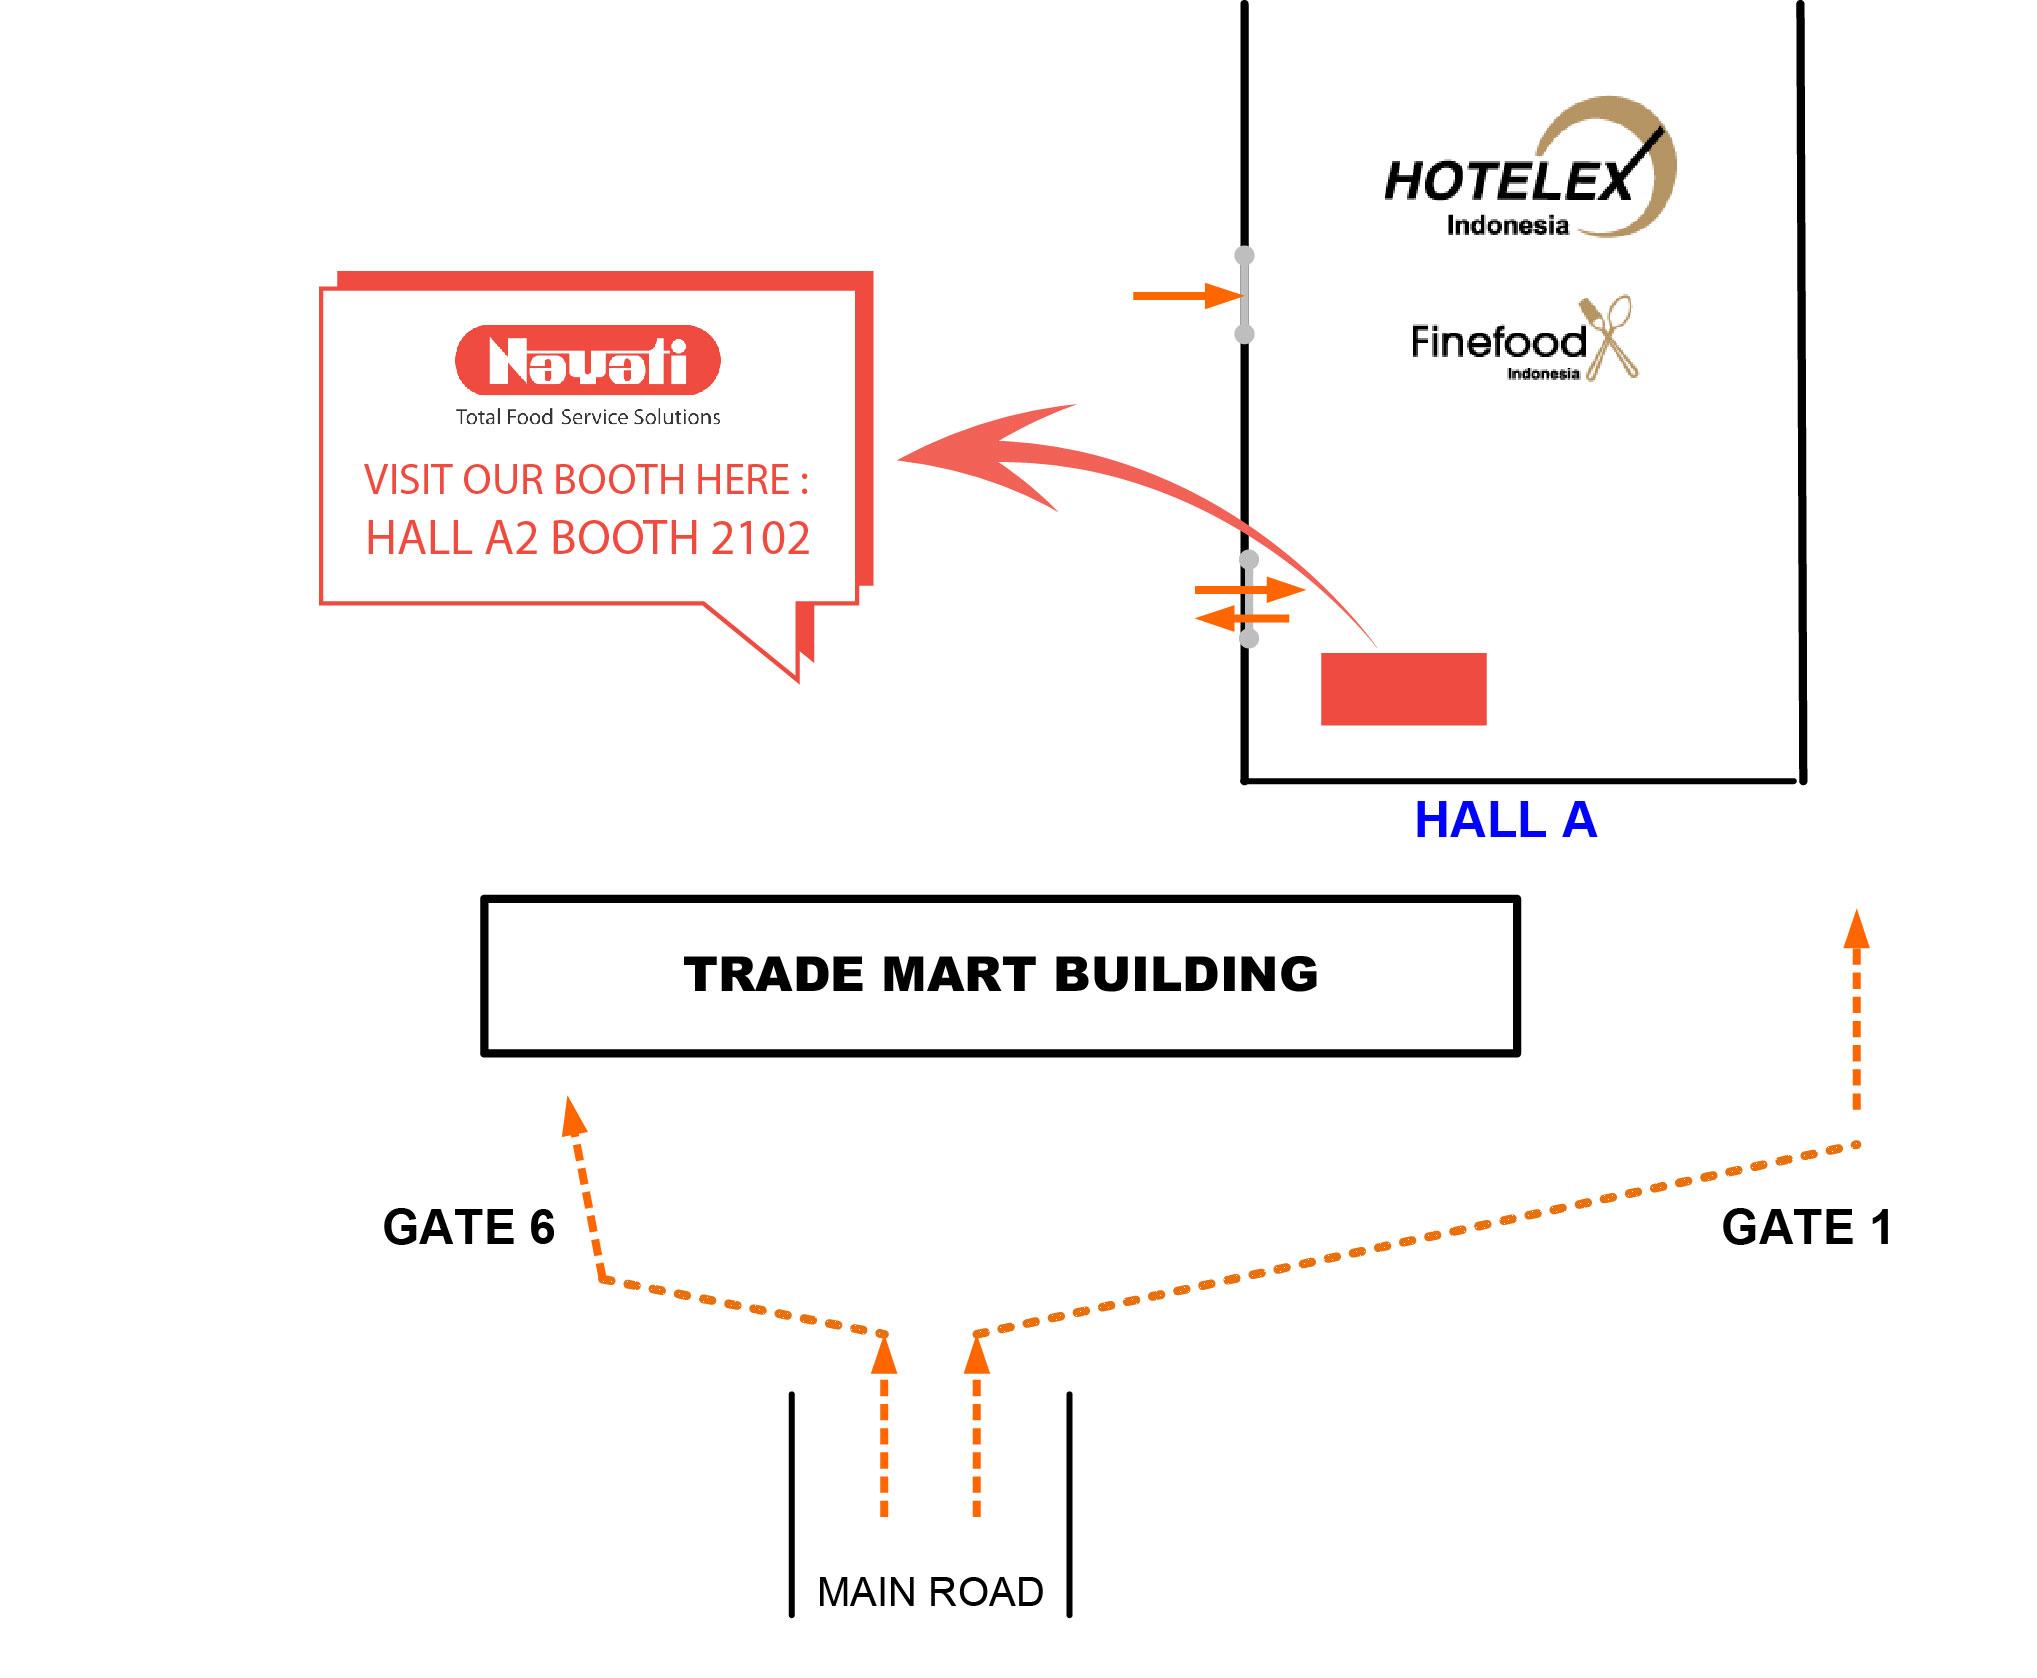 JIExpo Halls AD HOTELEX Indonesia 2018